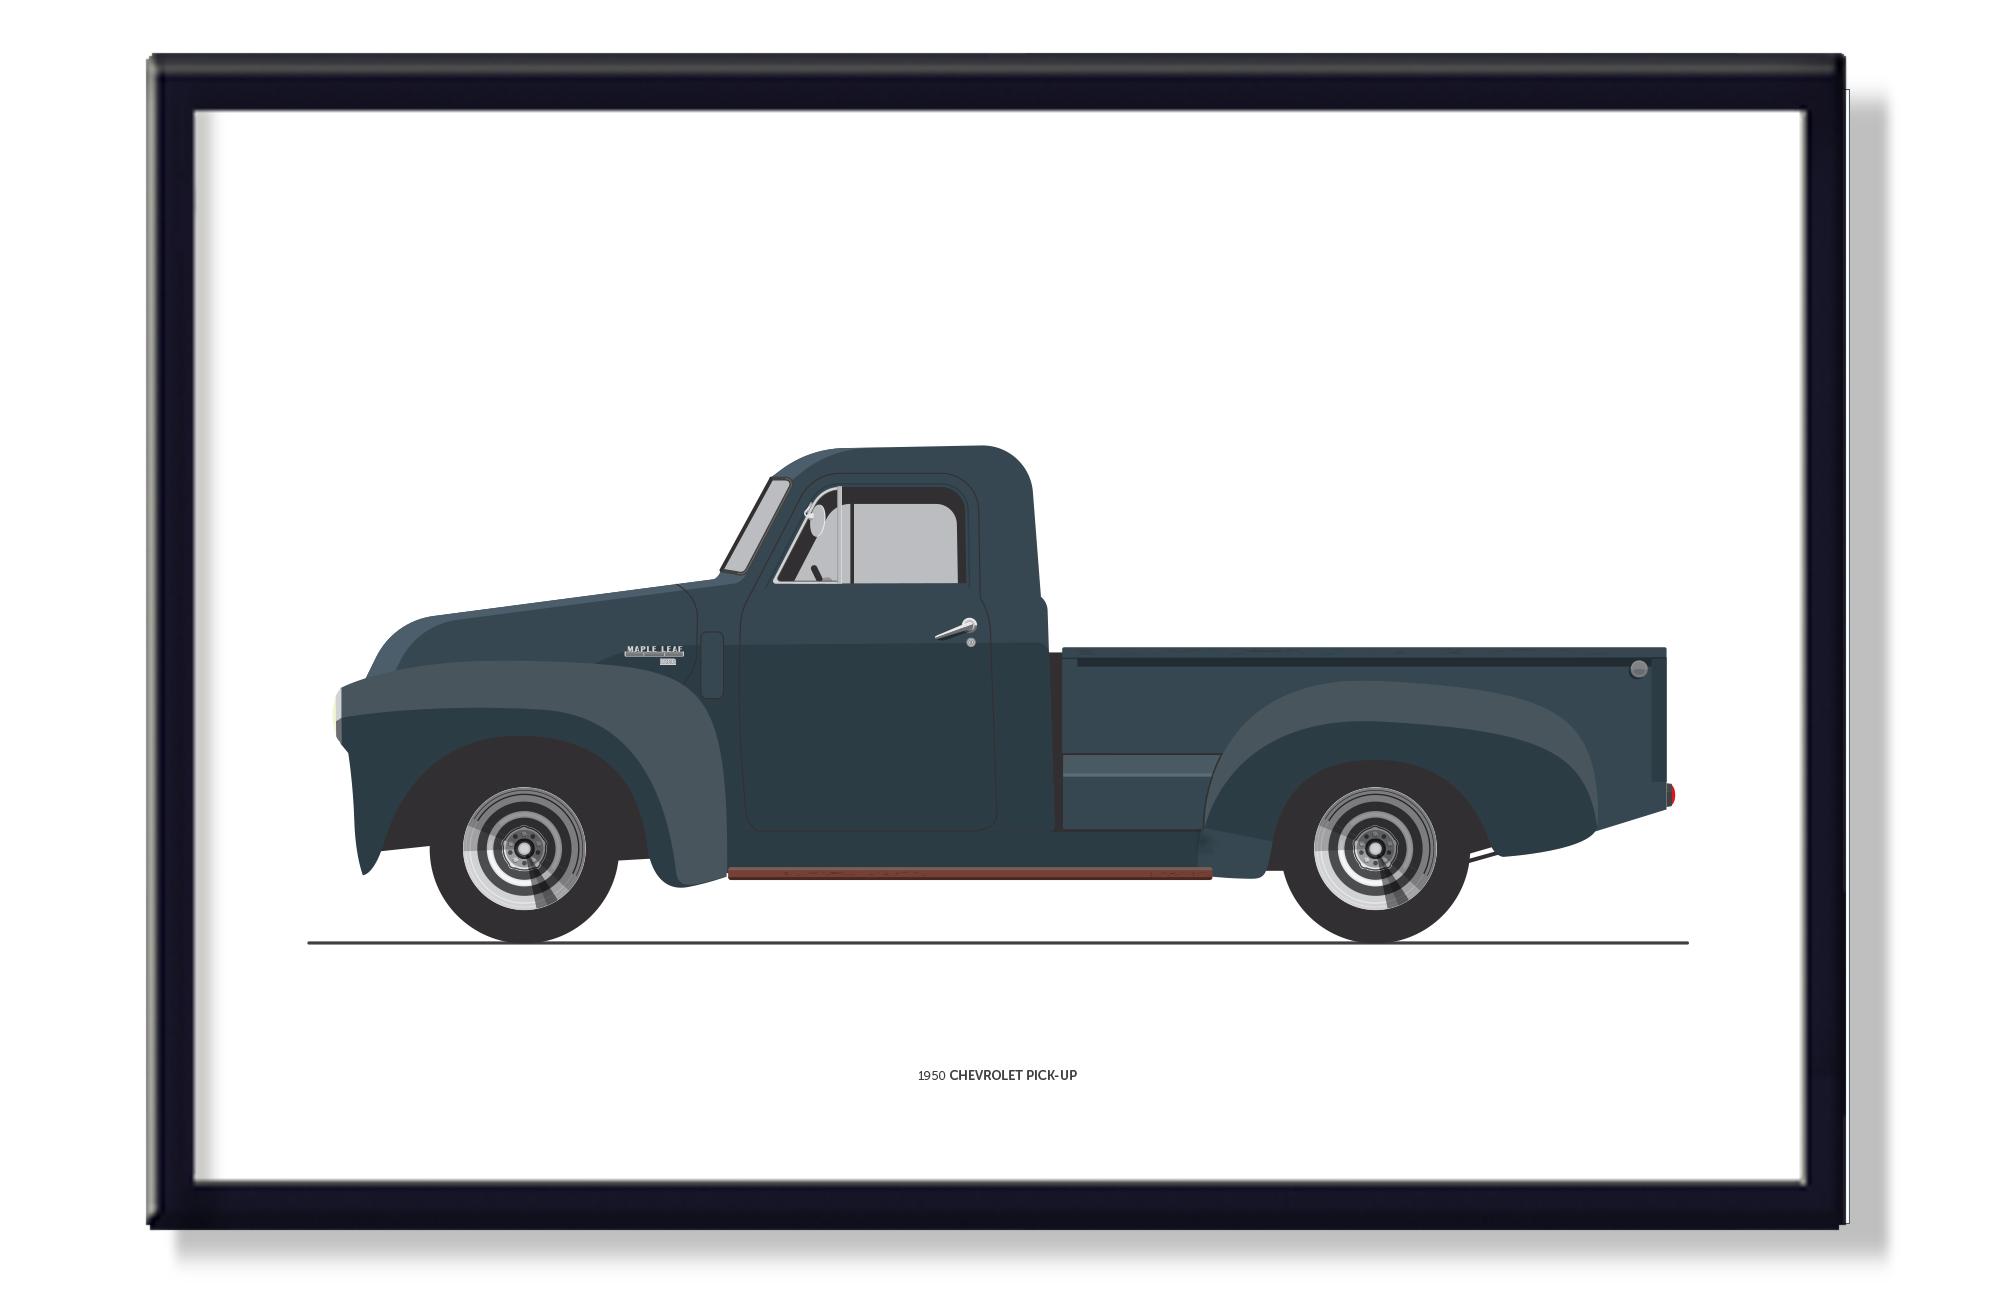 Blog-image-Chevrolet-Pick-up